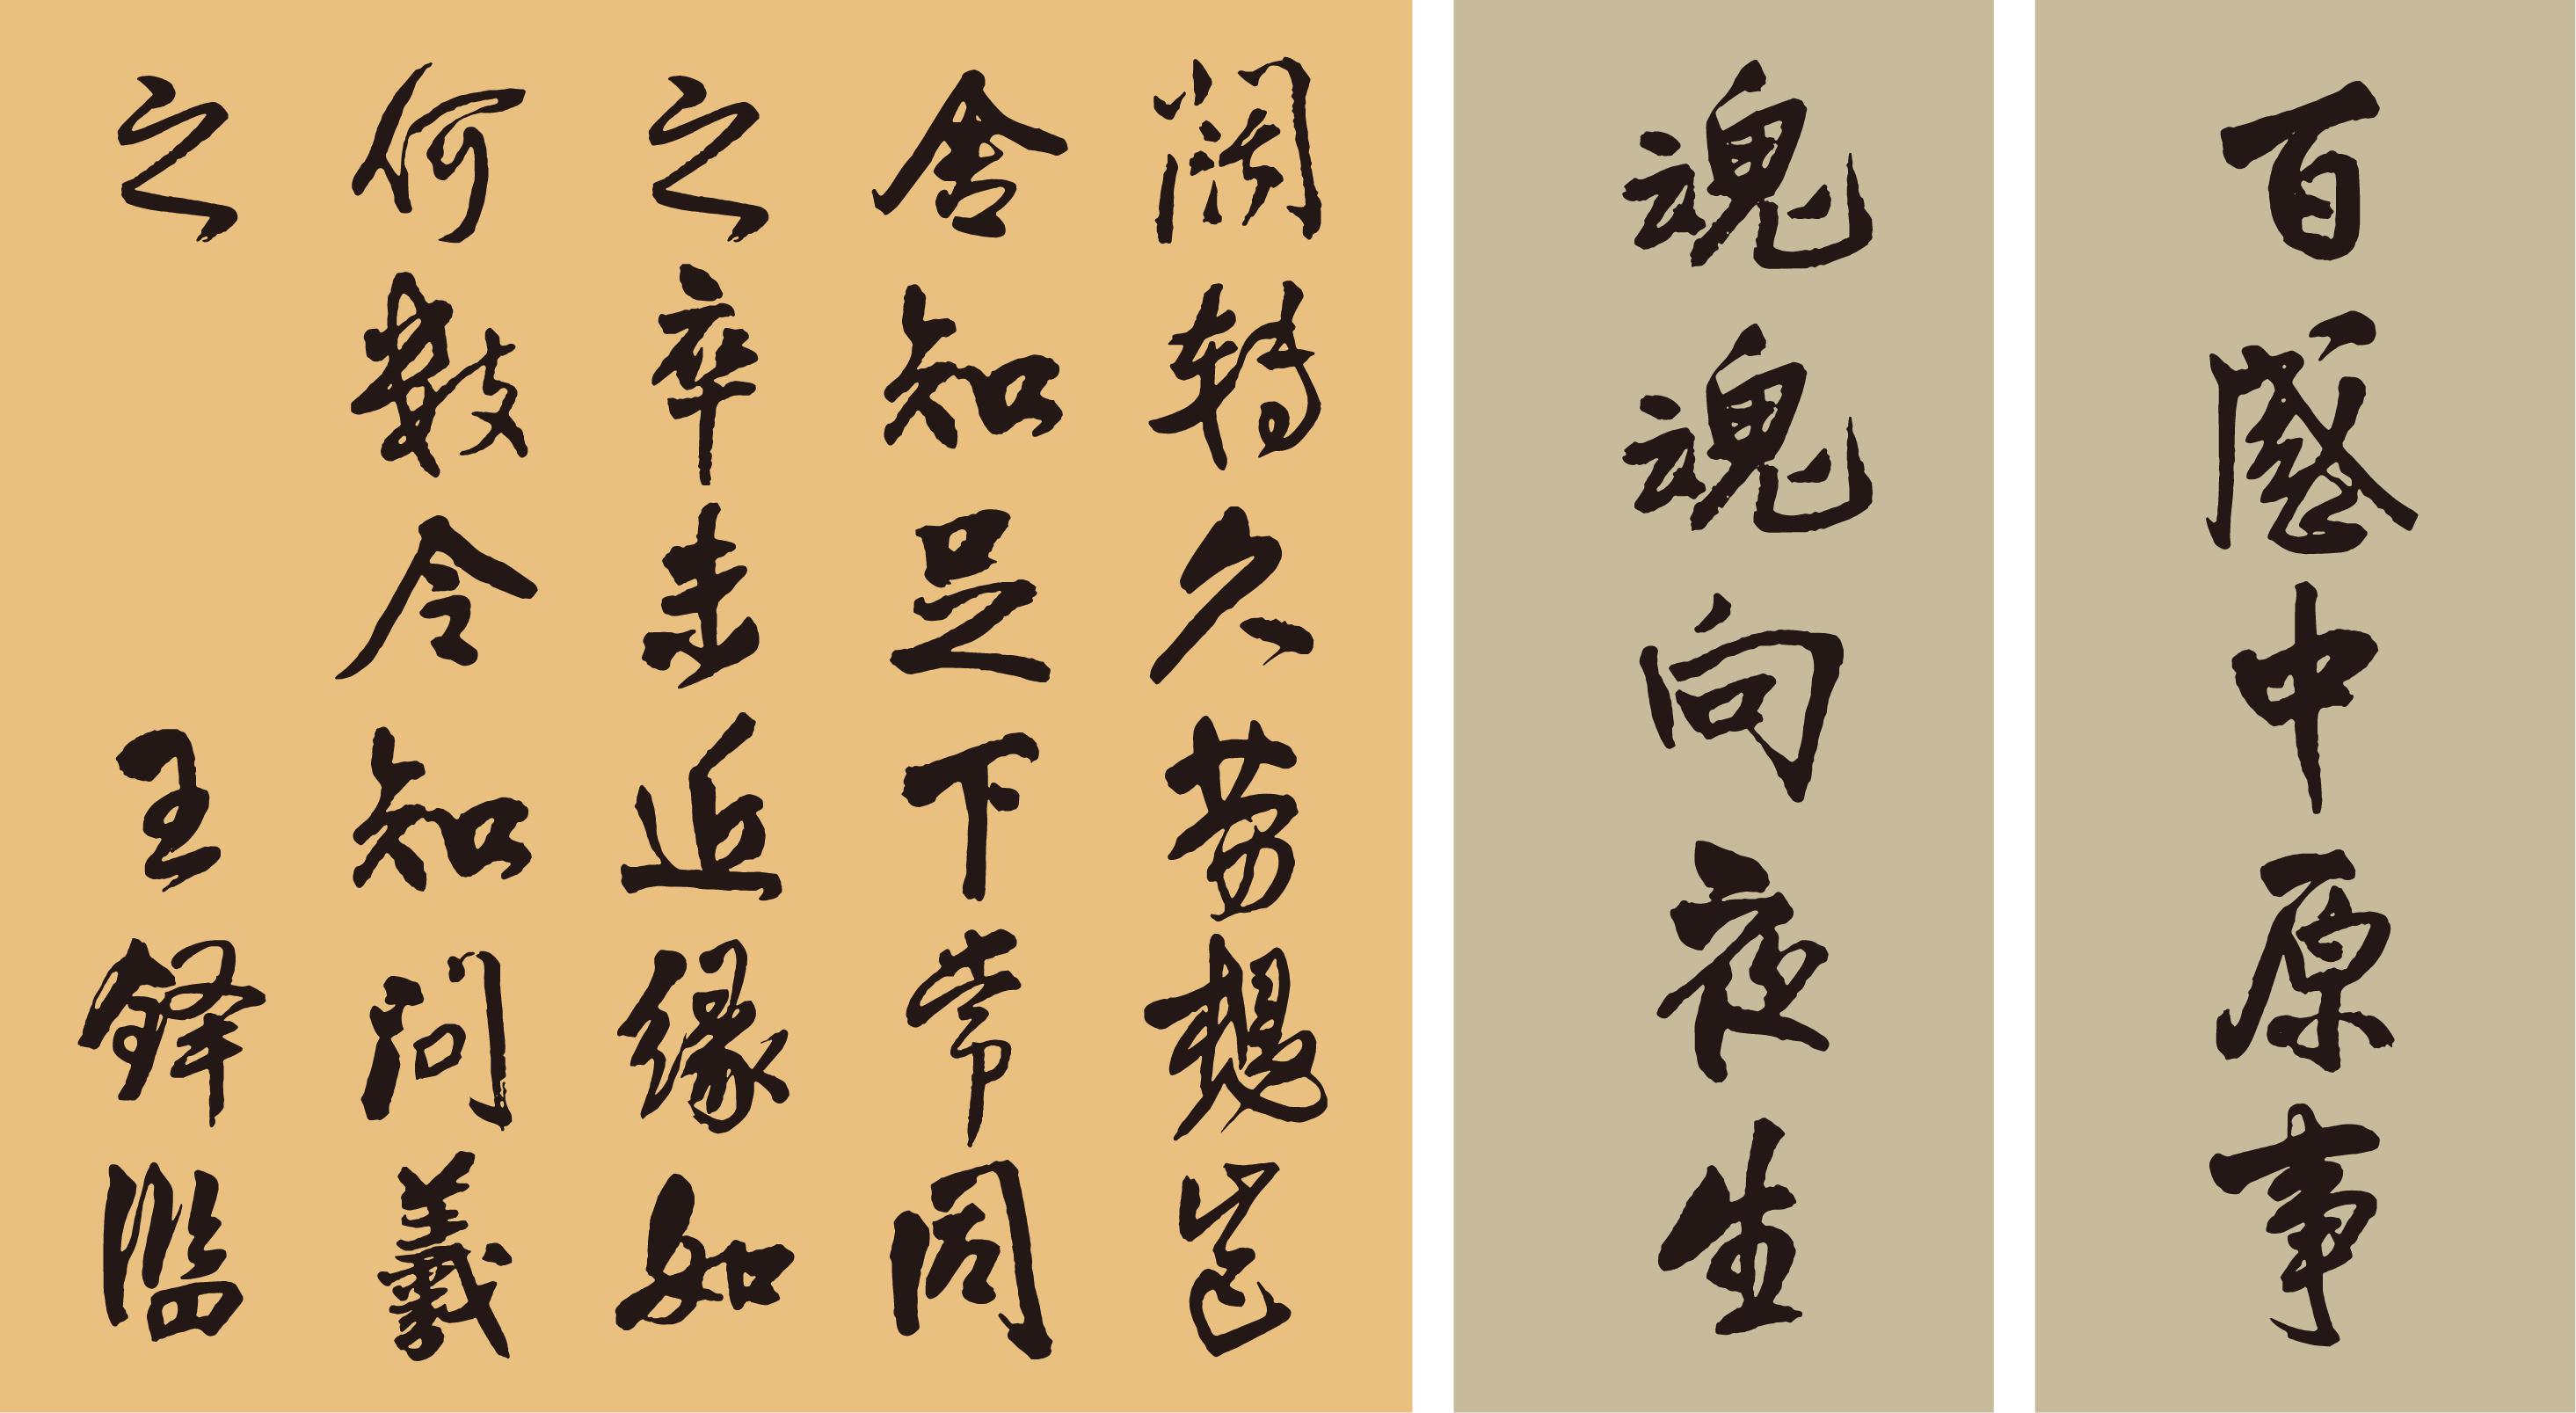 https://ft-bk1.oss-cn-zhangjiakou.aliyuncs.com/Public/Uploads/img/n_content_20201210174813_4547.png